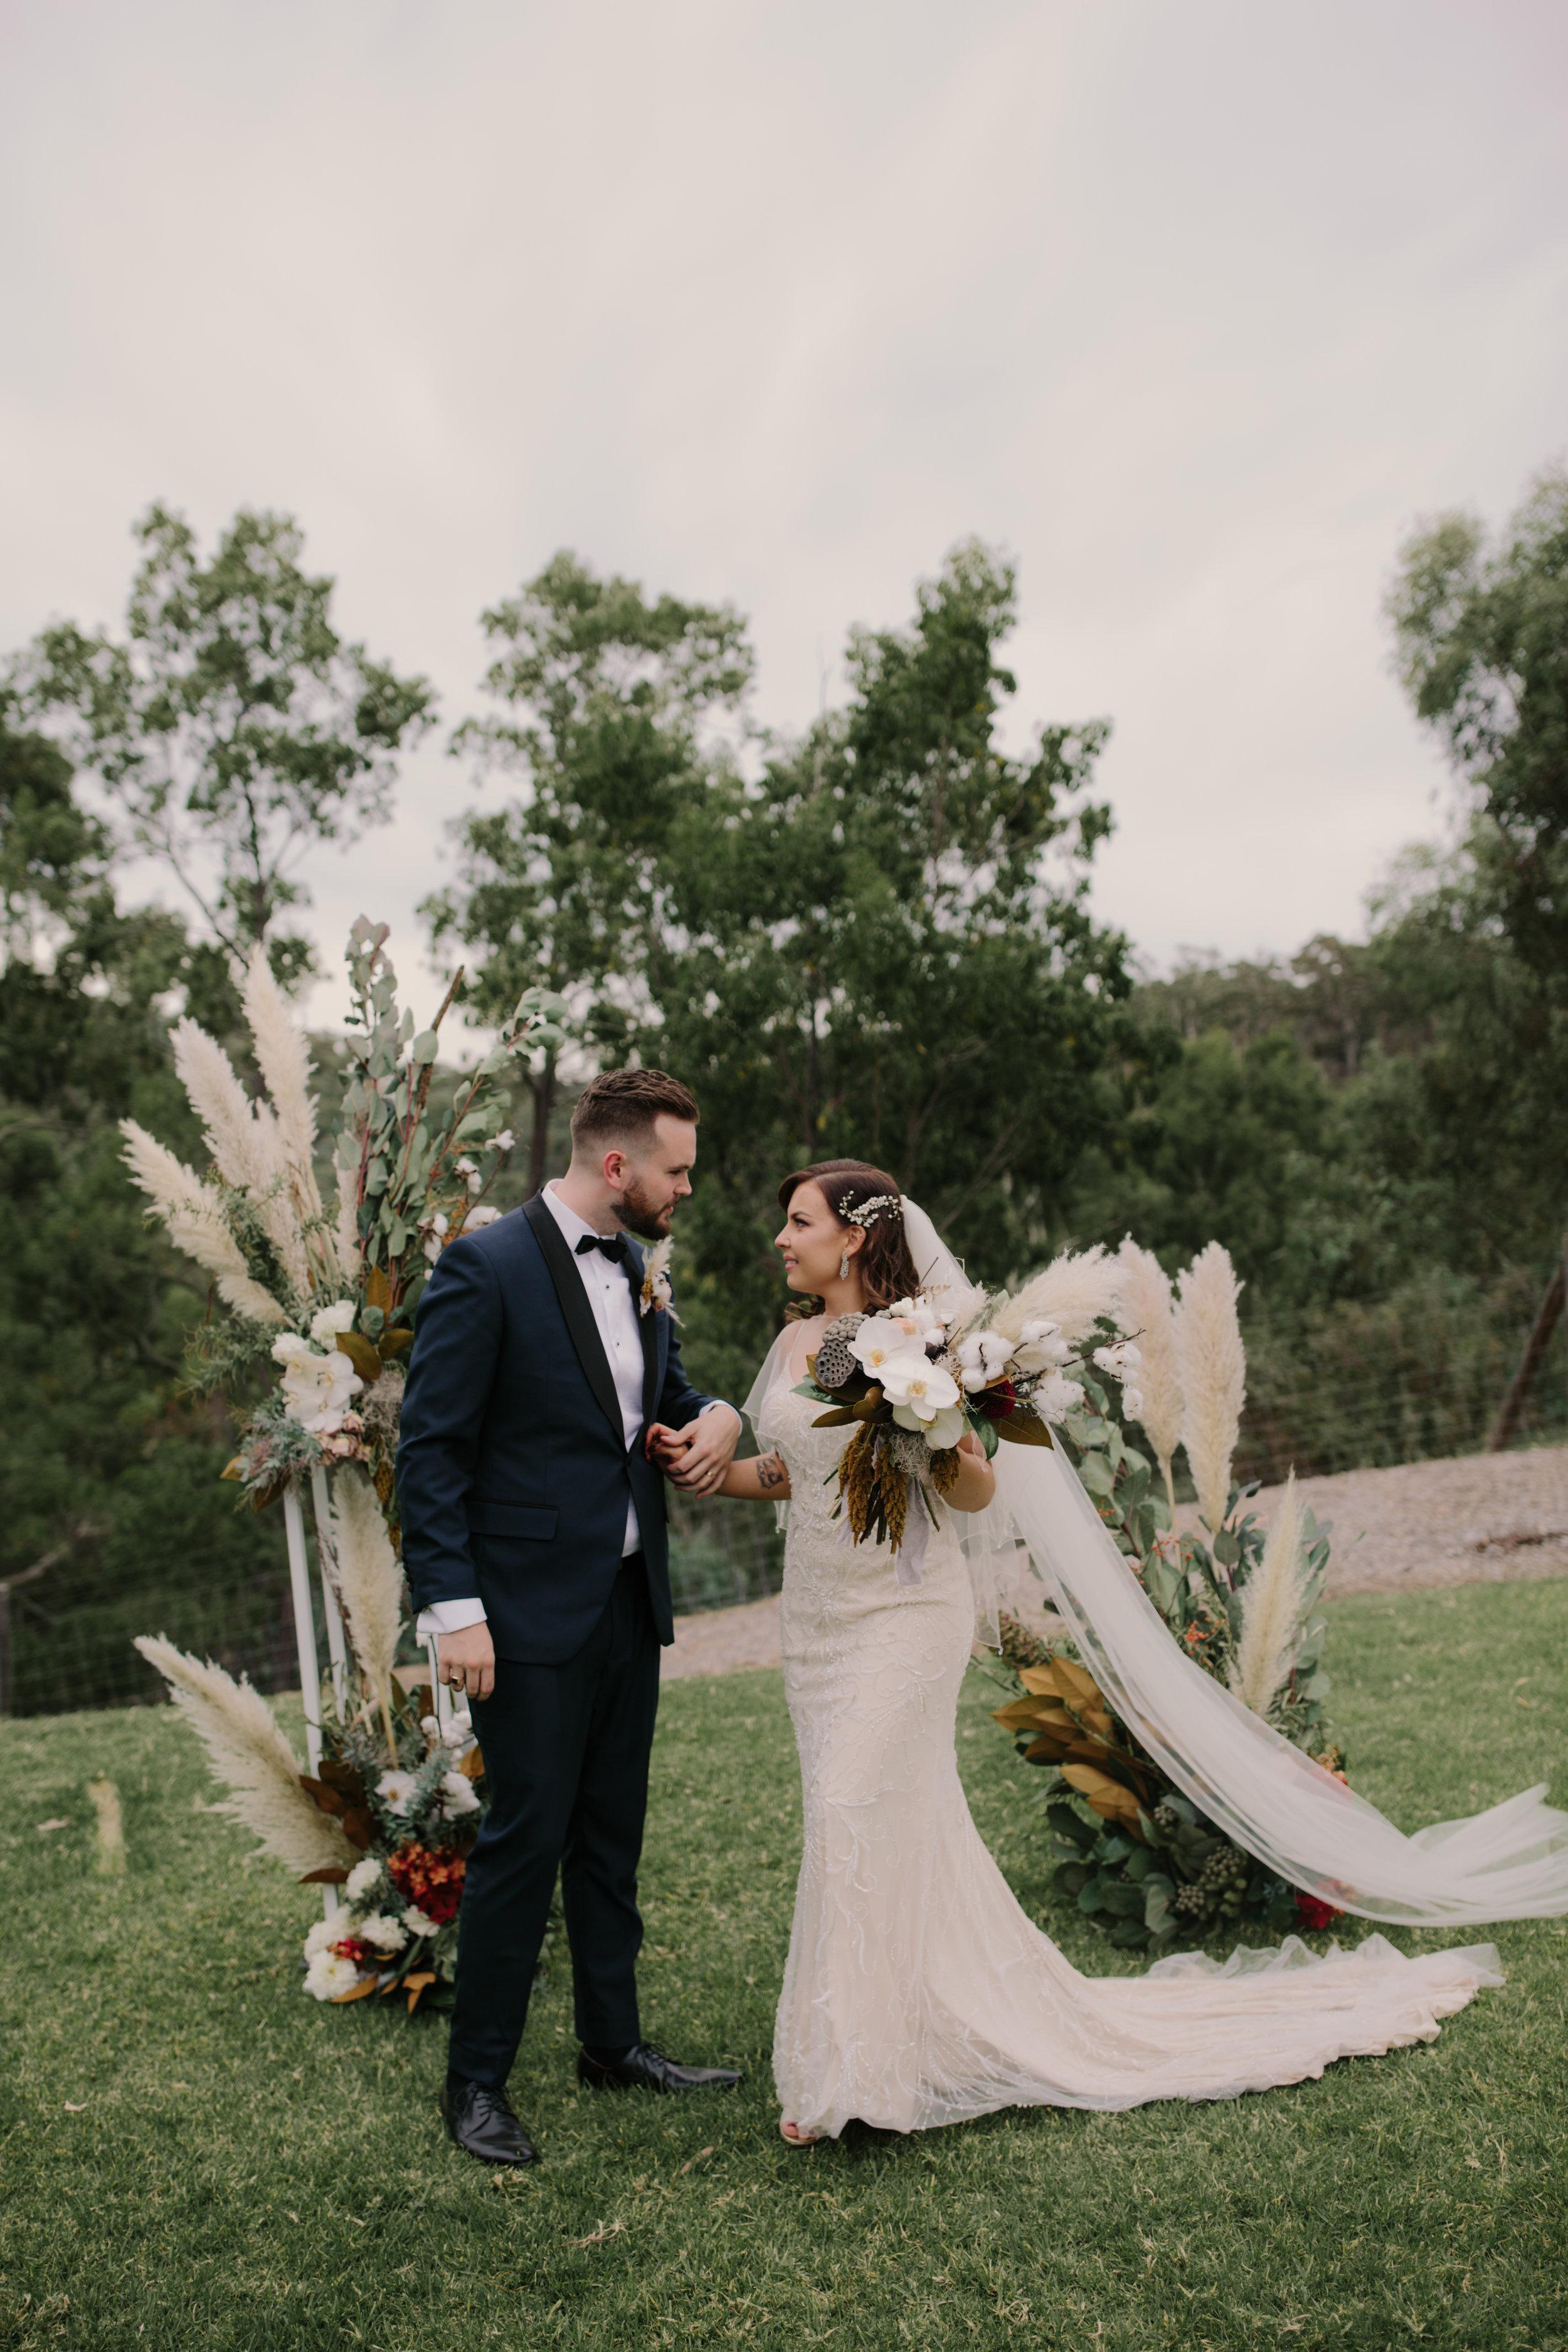 I-Got-You-Babe-Weddings-Melanie-Isaac0496.JPG